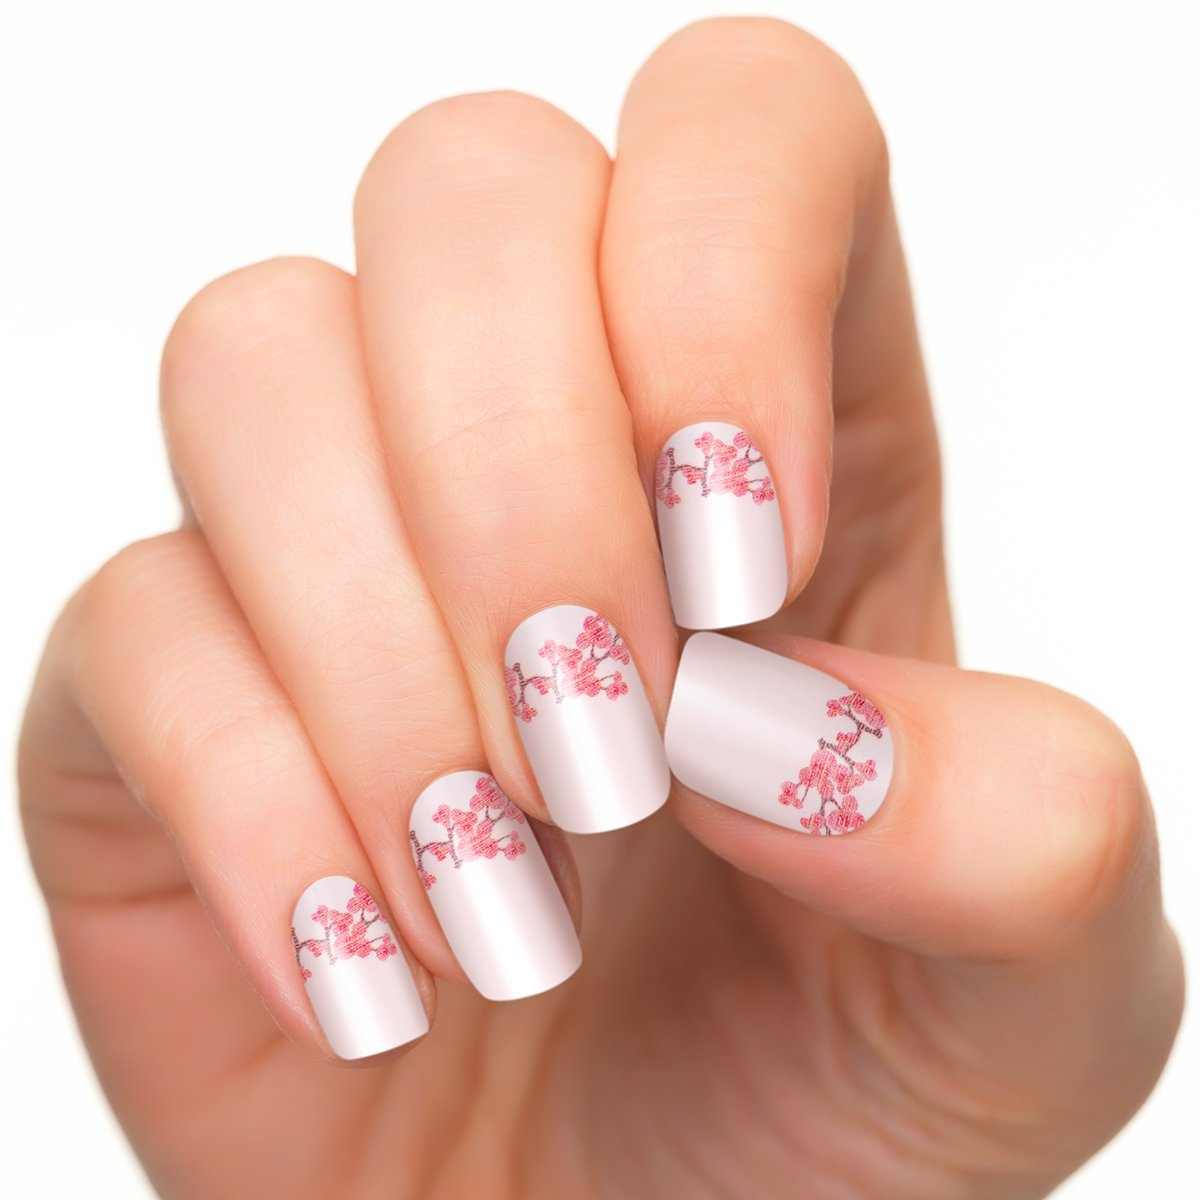 Incoco Nail Polish Strips, Nail Art, In Bloom